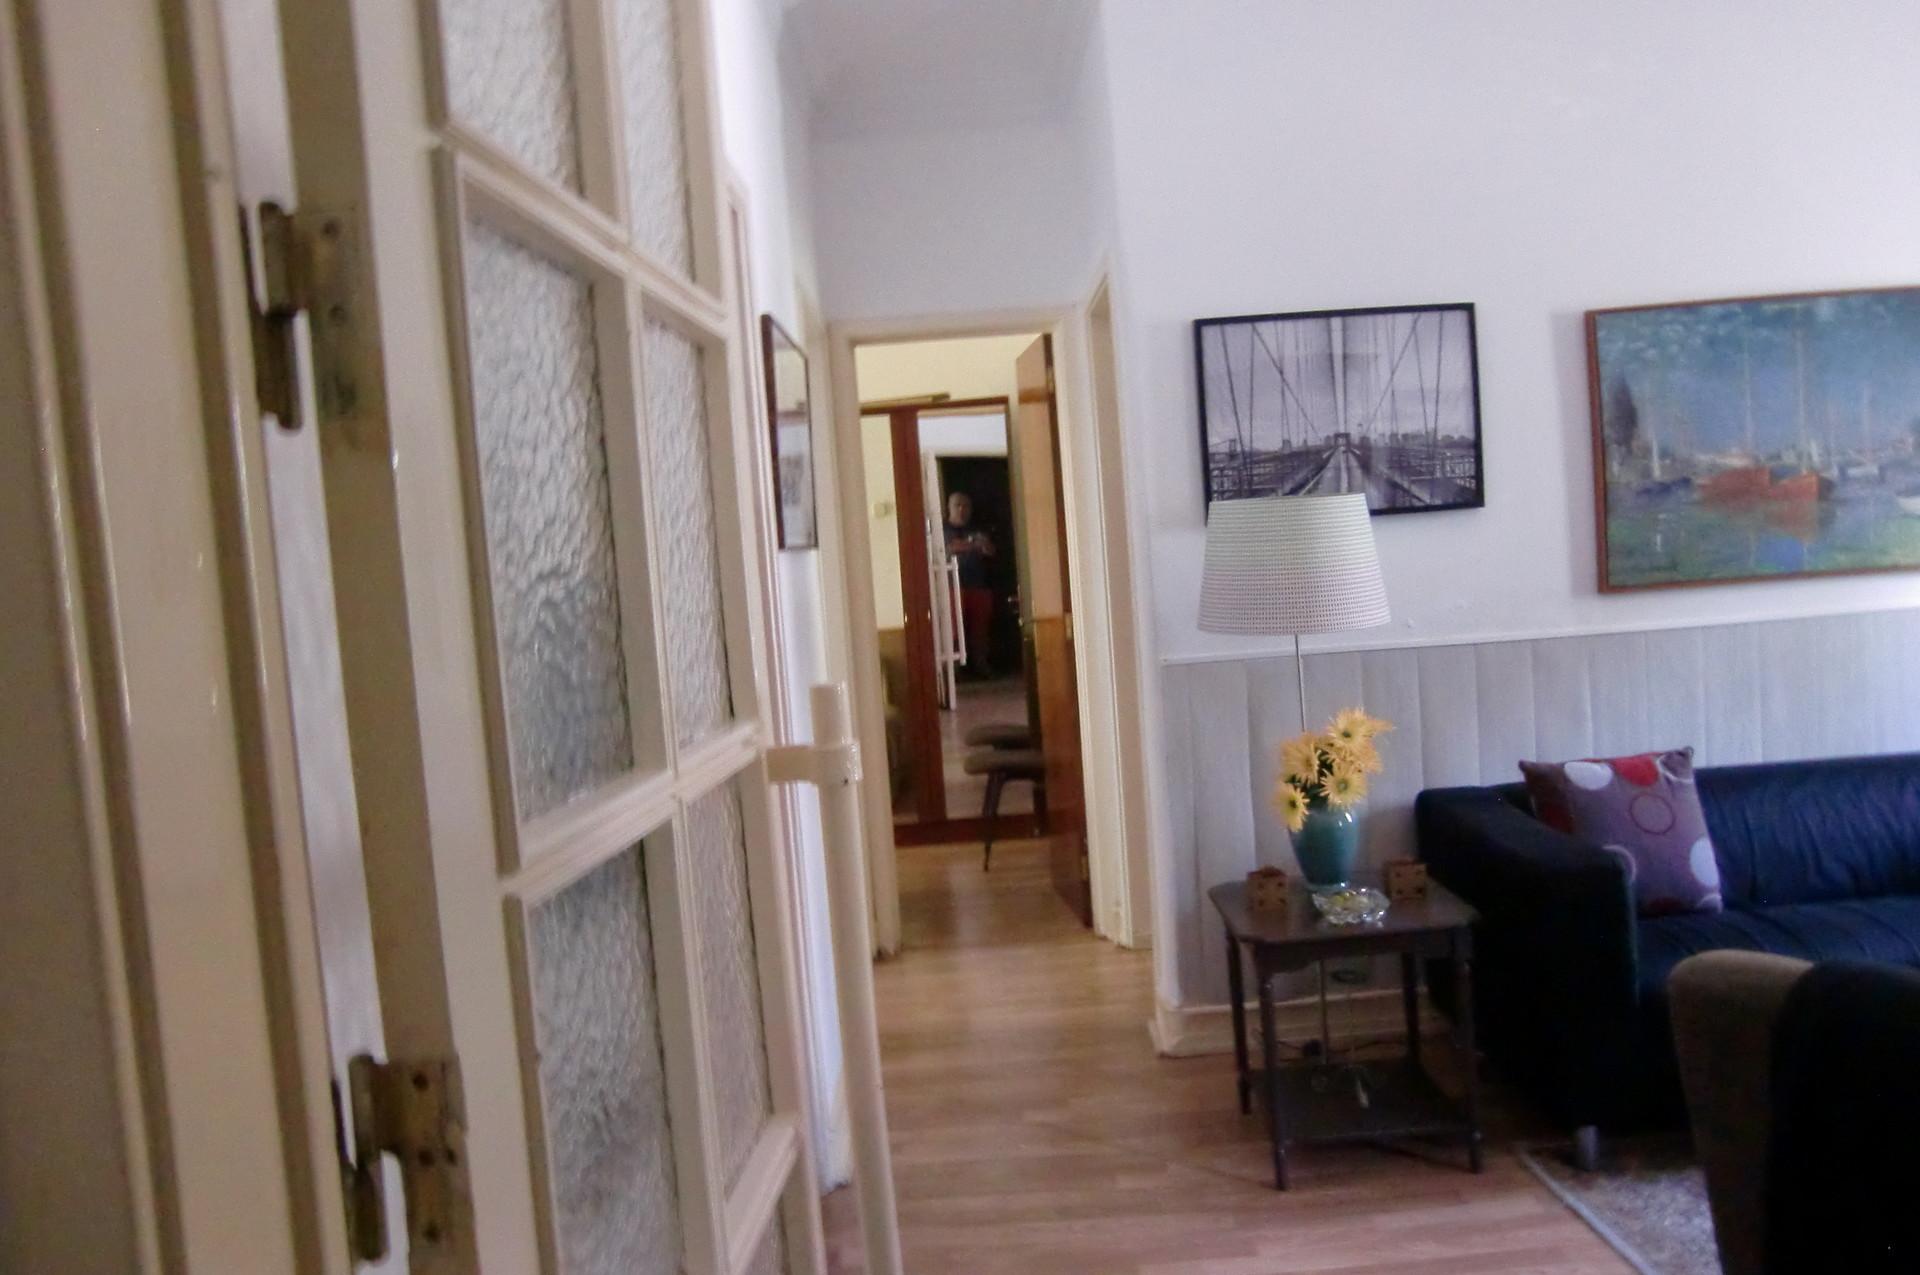 near-avenida-roma-alvalade-square-apartment-great-location-9ccfb8bf3b859f7a0ea65485d9cdee86